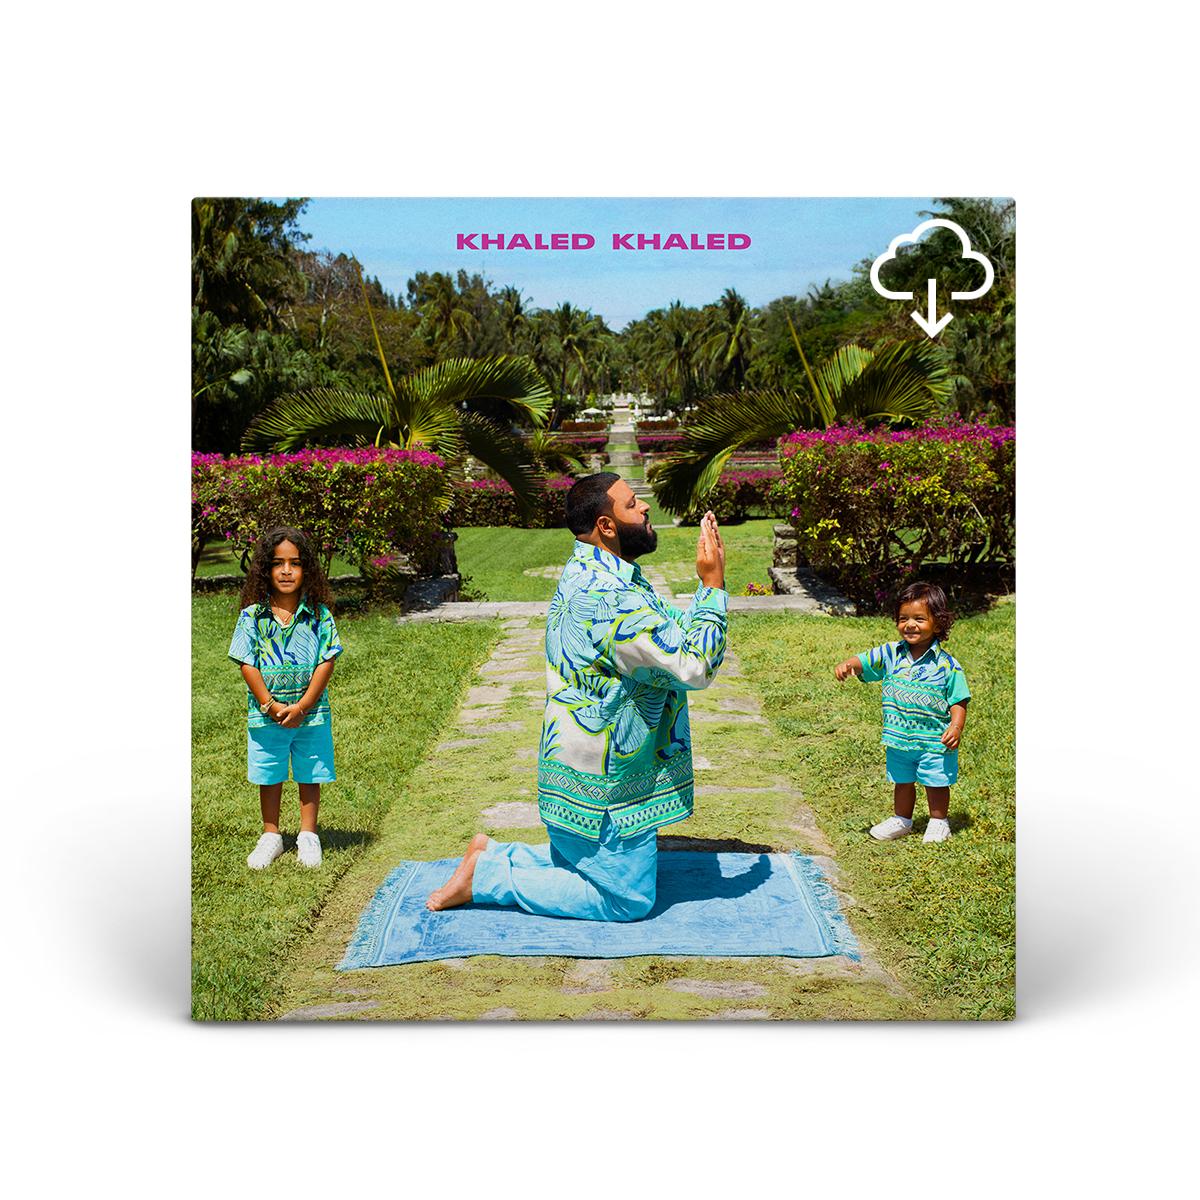 KHALED KHALED Digital Album Download (Clean)